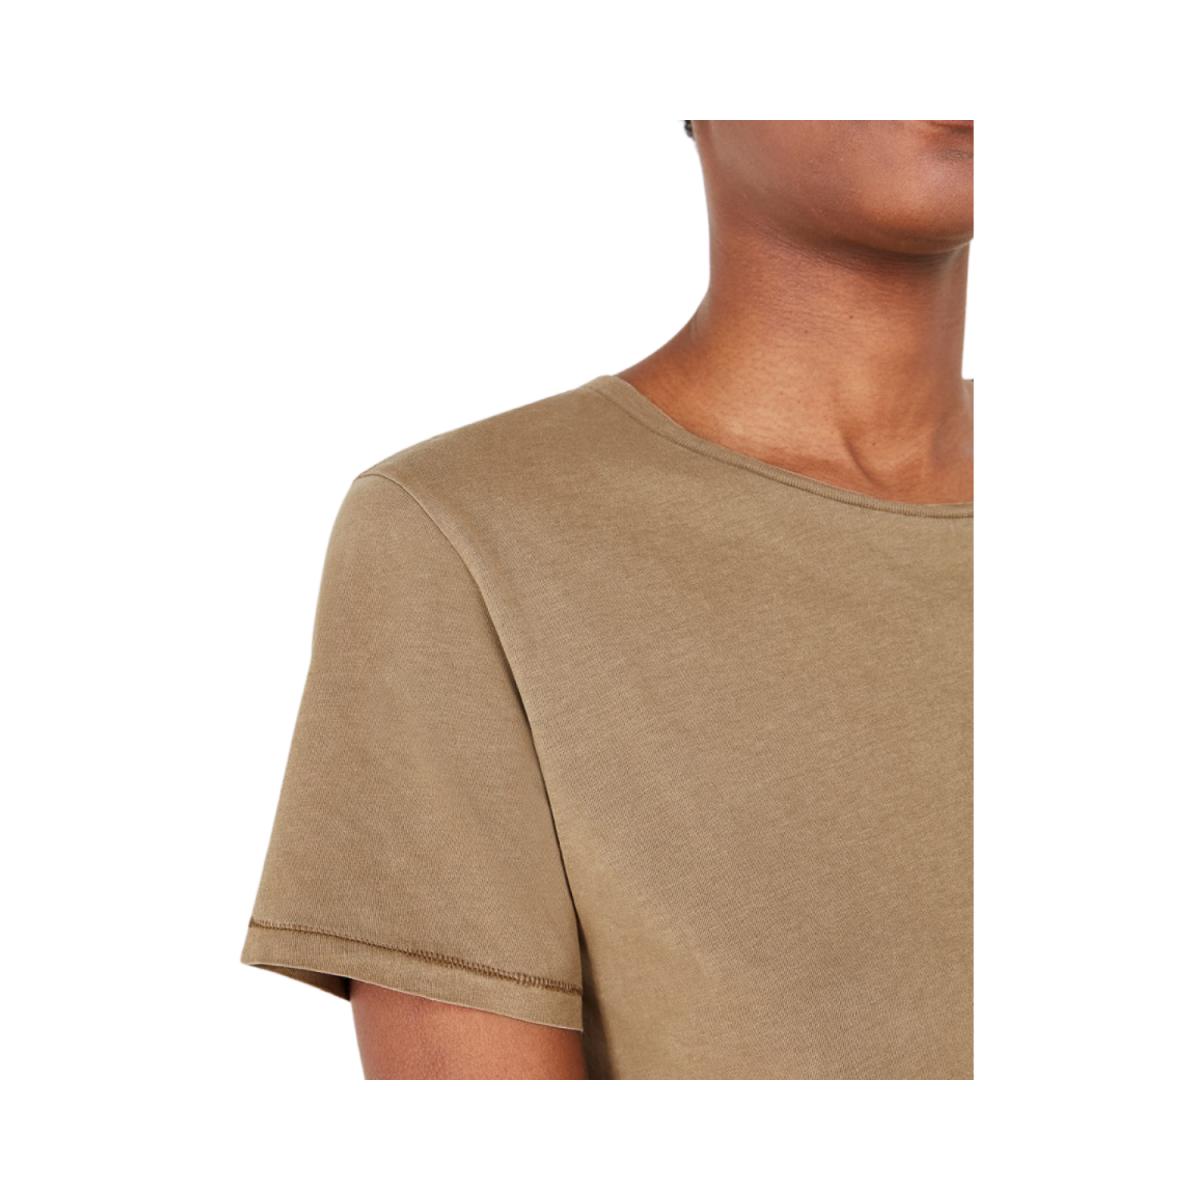 vegiflower t-shirt - camel - detalje billede